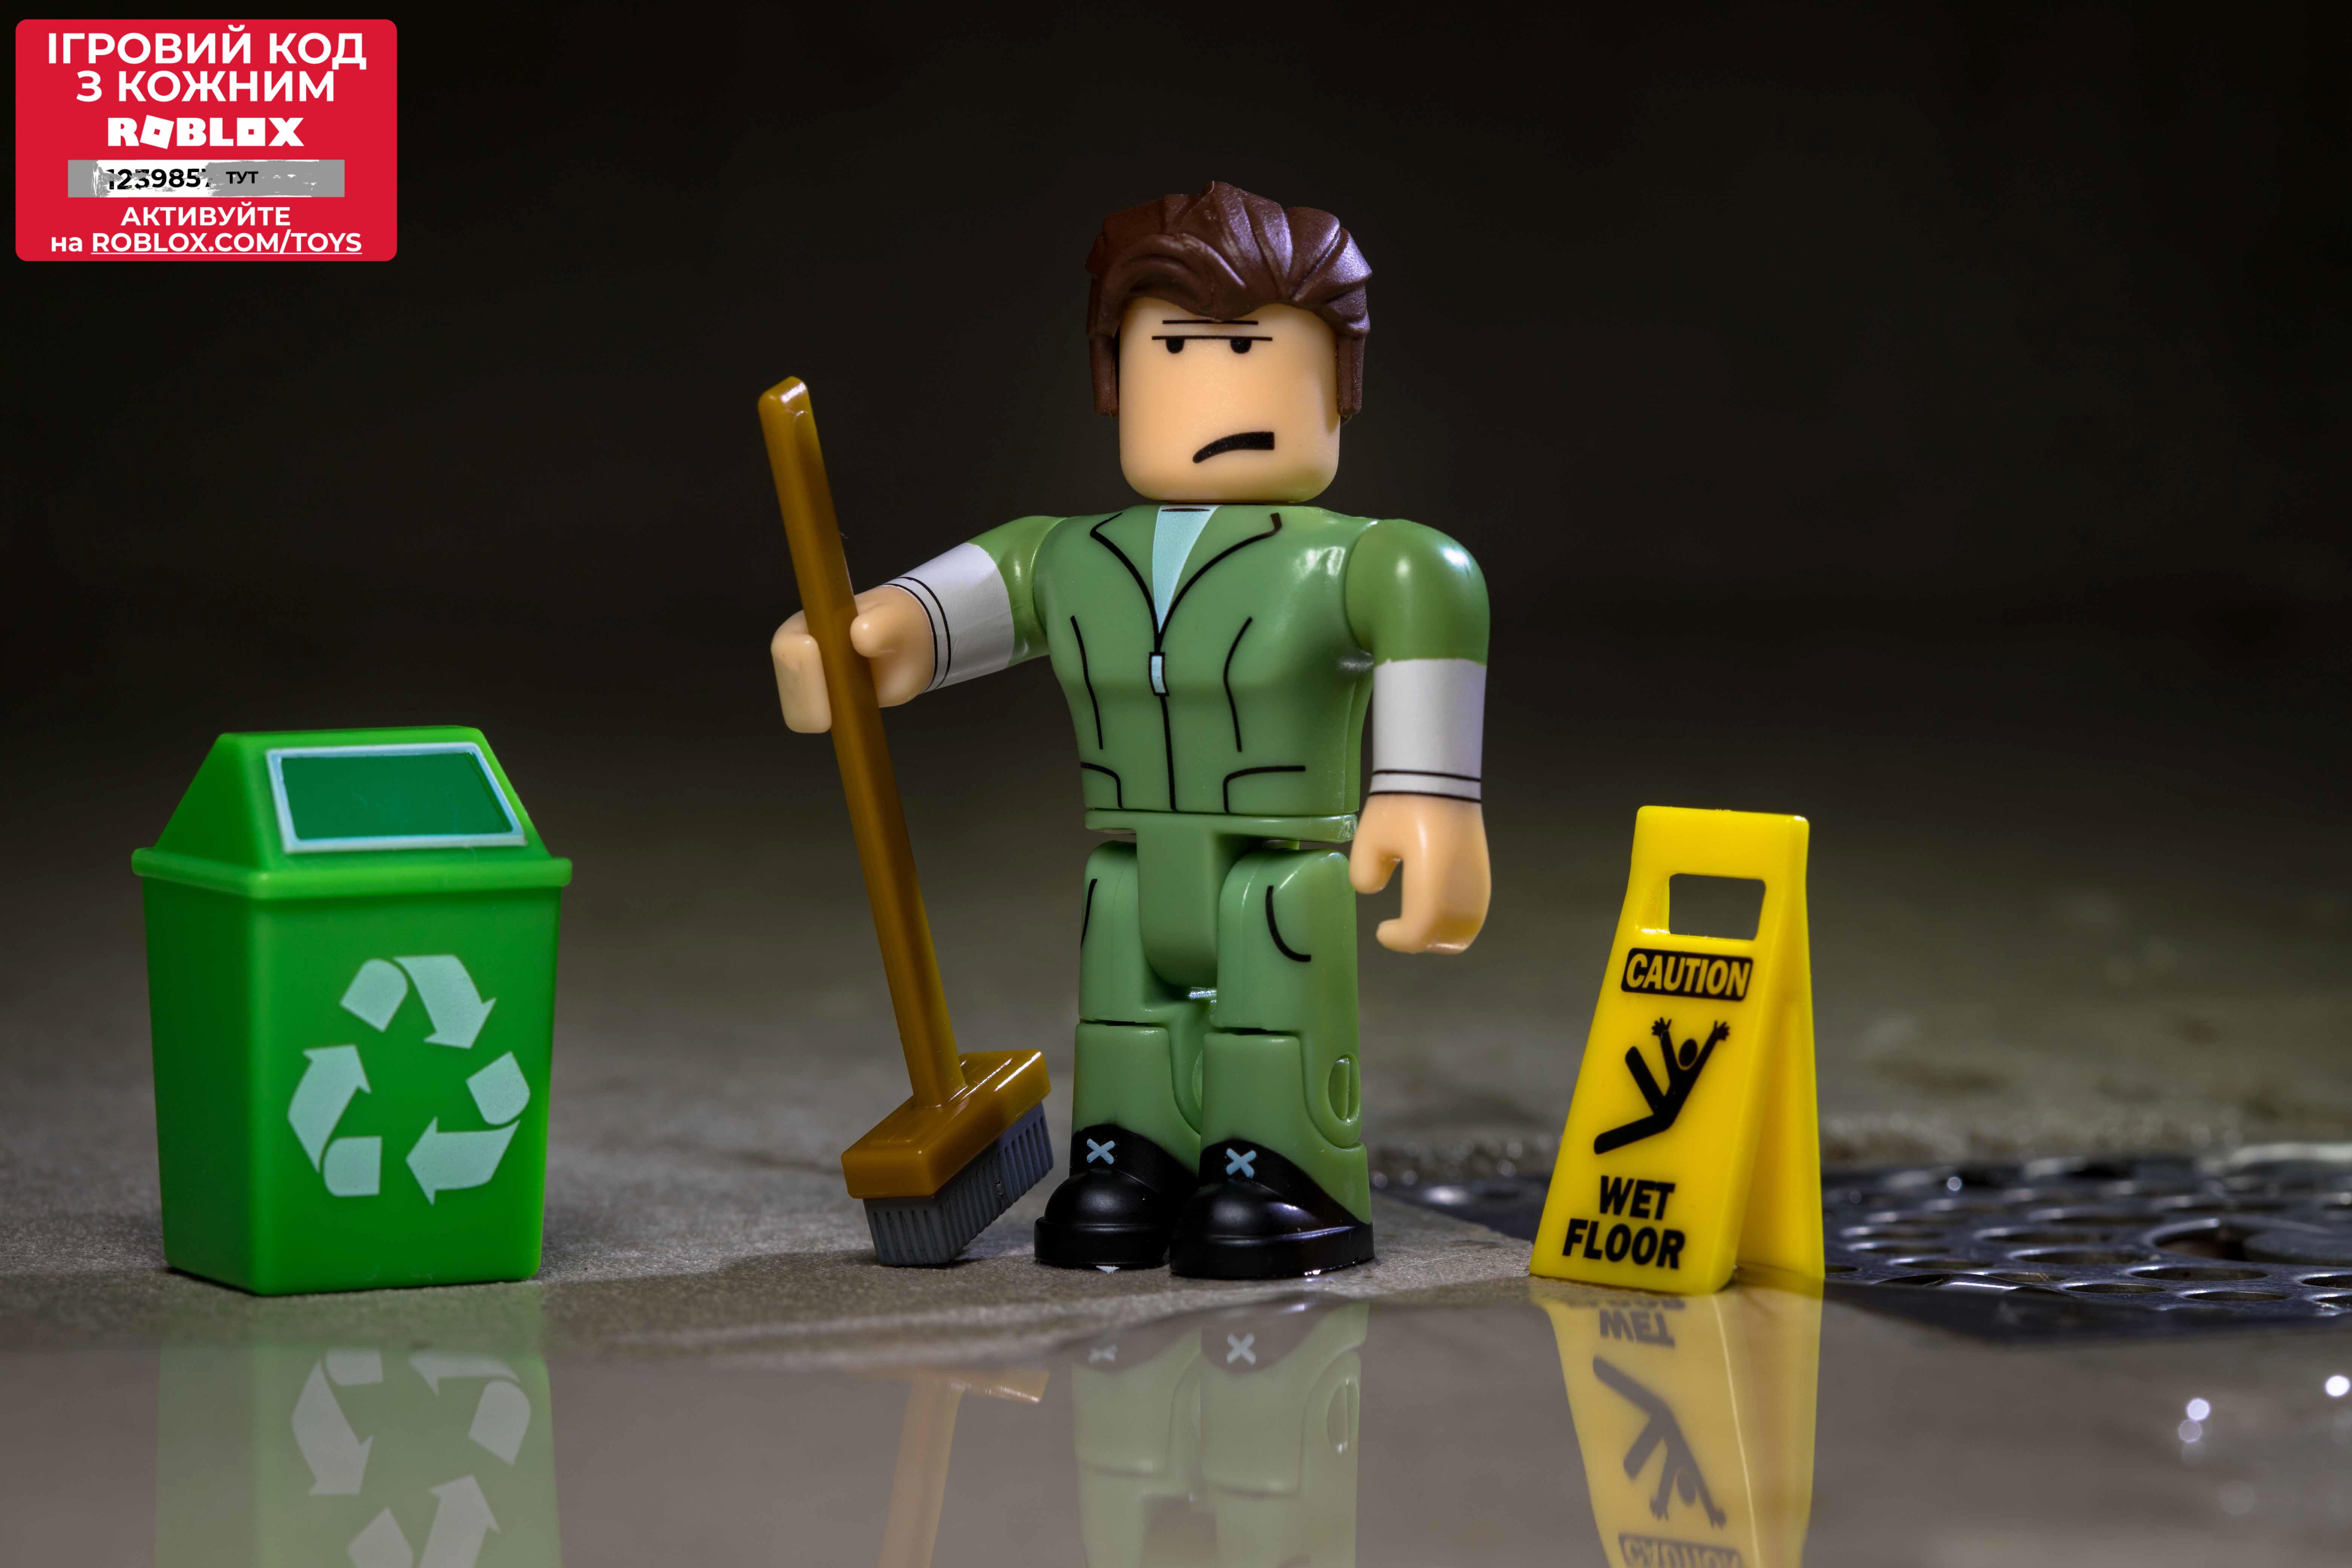 Roblox Игровая коллекционная фигурка Сore Figures Welcome to Bloxburg: Glen the Janitor W3